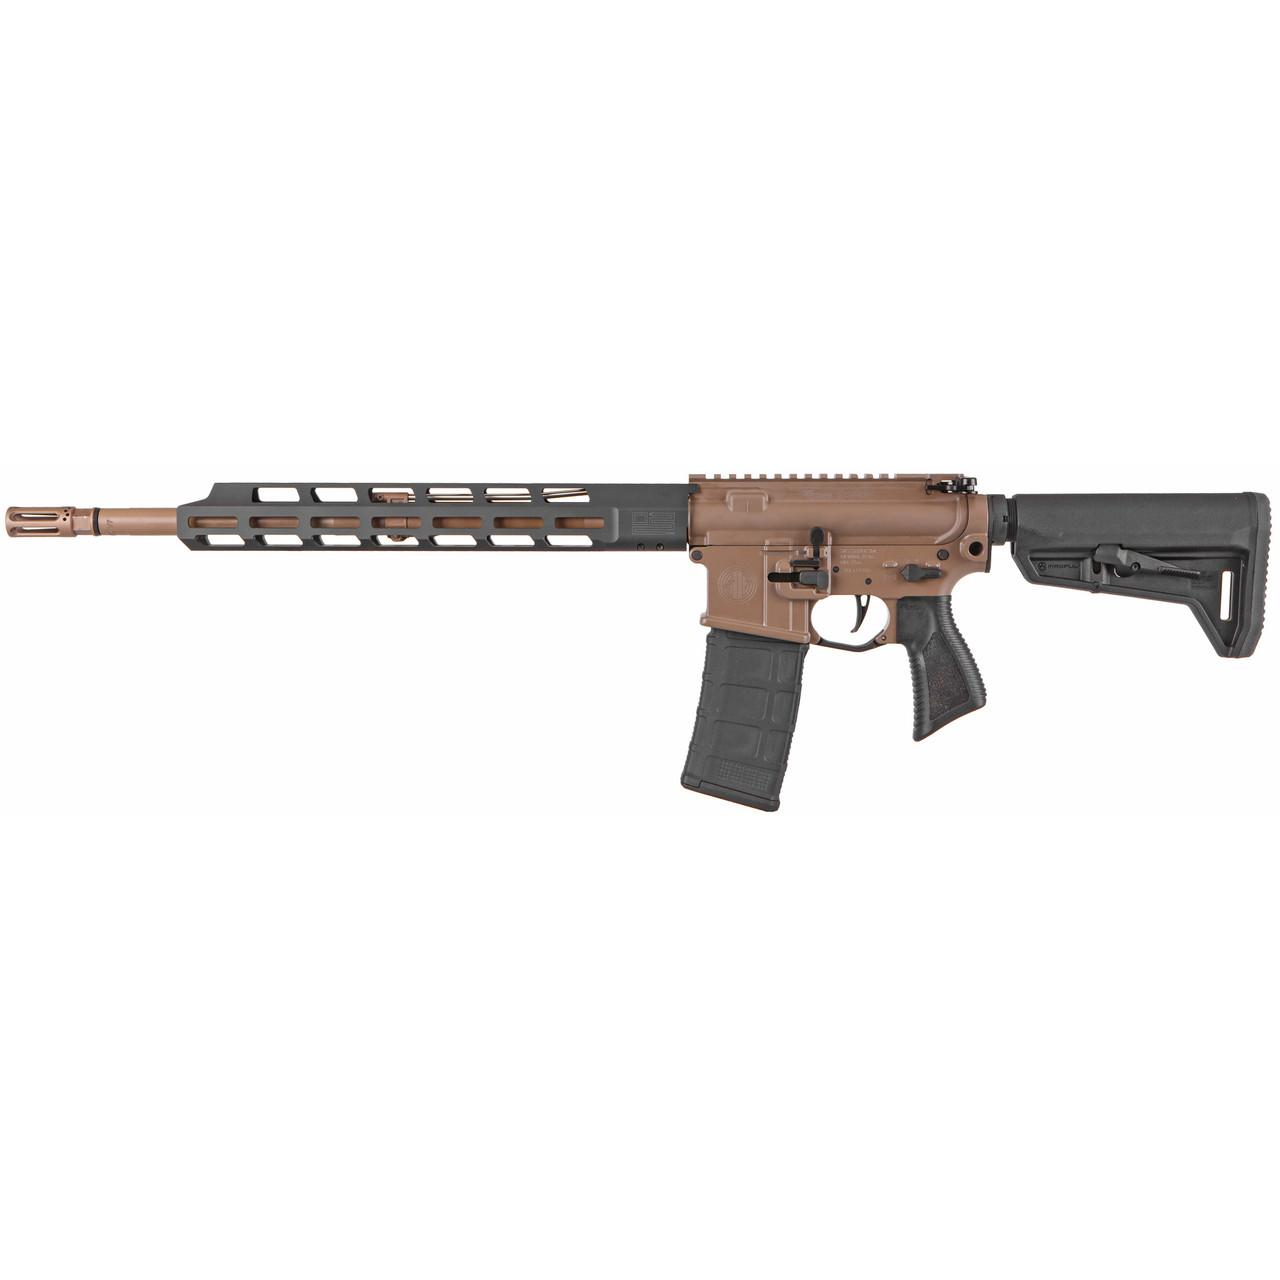 Sig Sauer M400 Tread Snakebite SE CALIFORNIA LEGAL - .233/5.56 - FDE